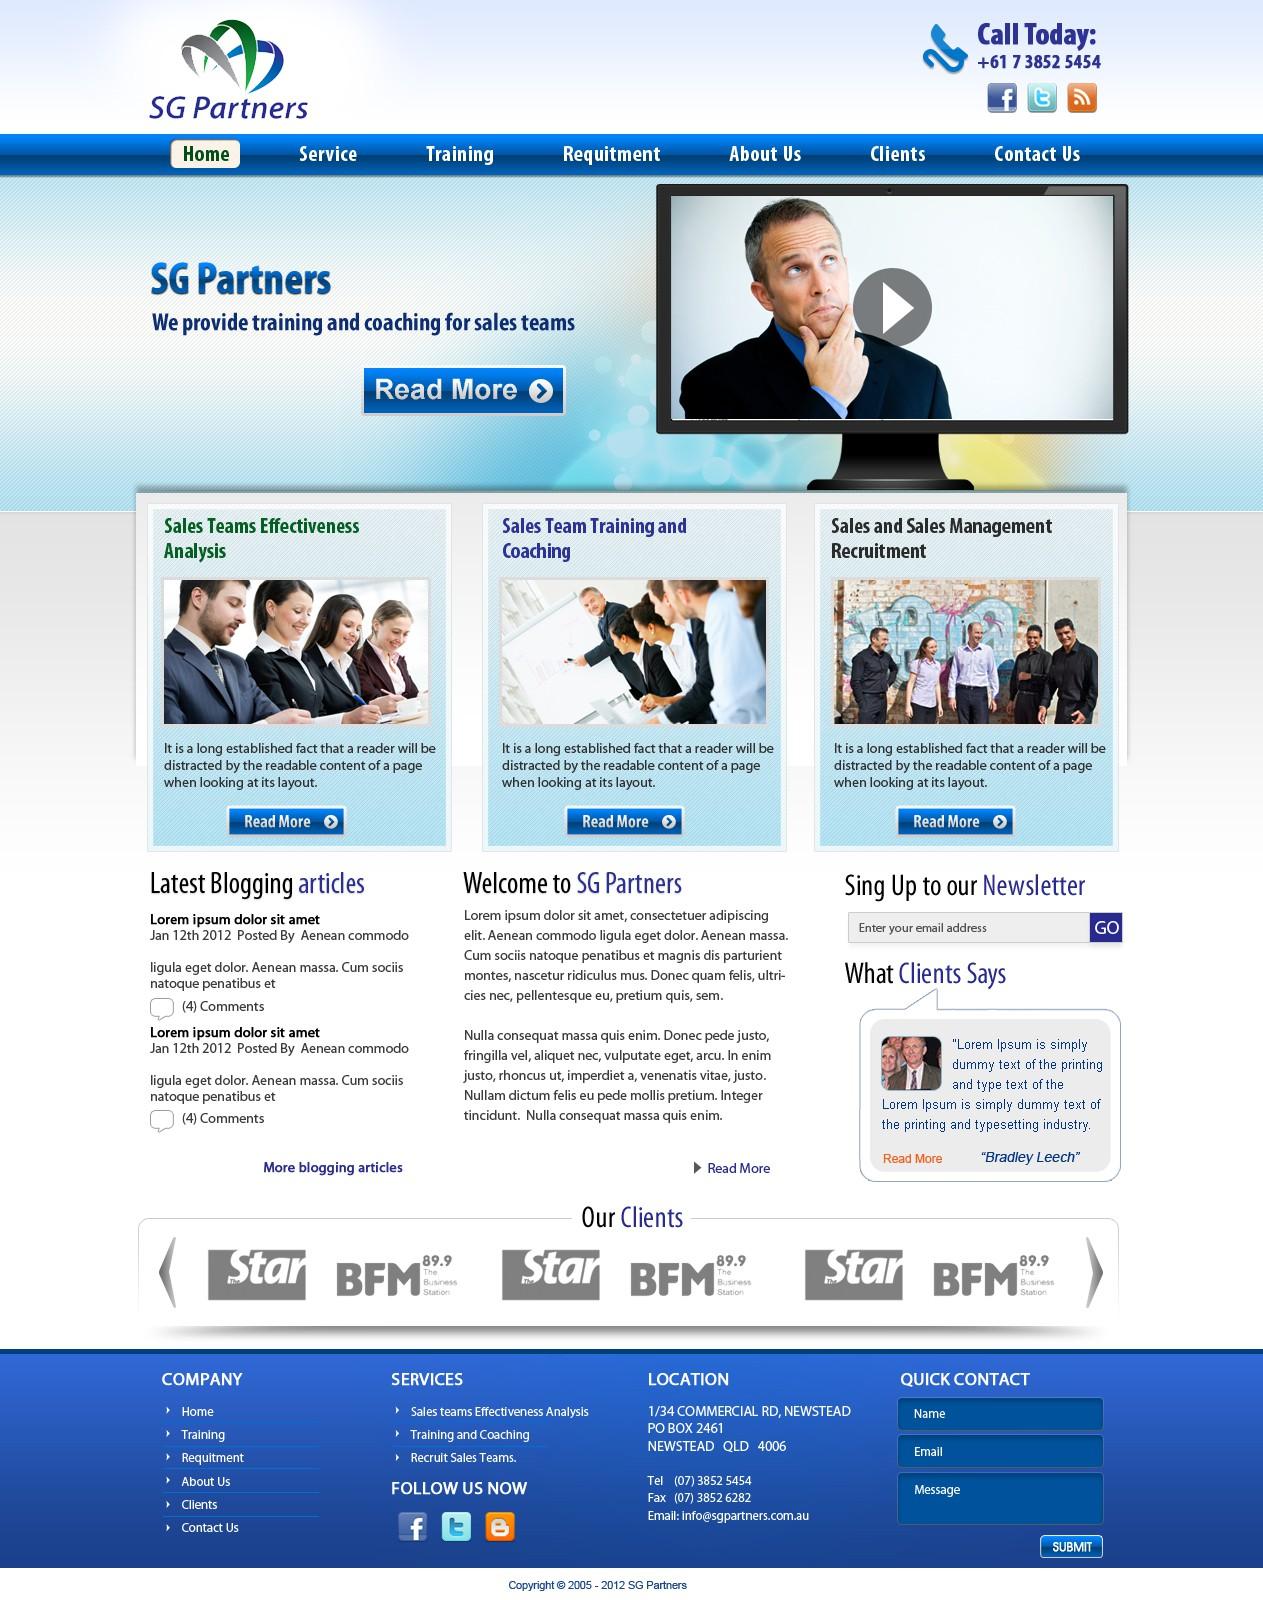 SG Partners needs a new website design